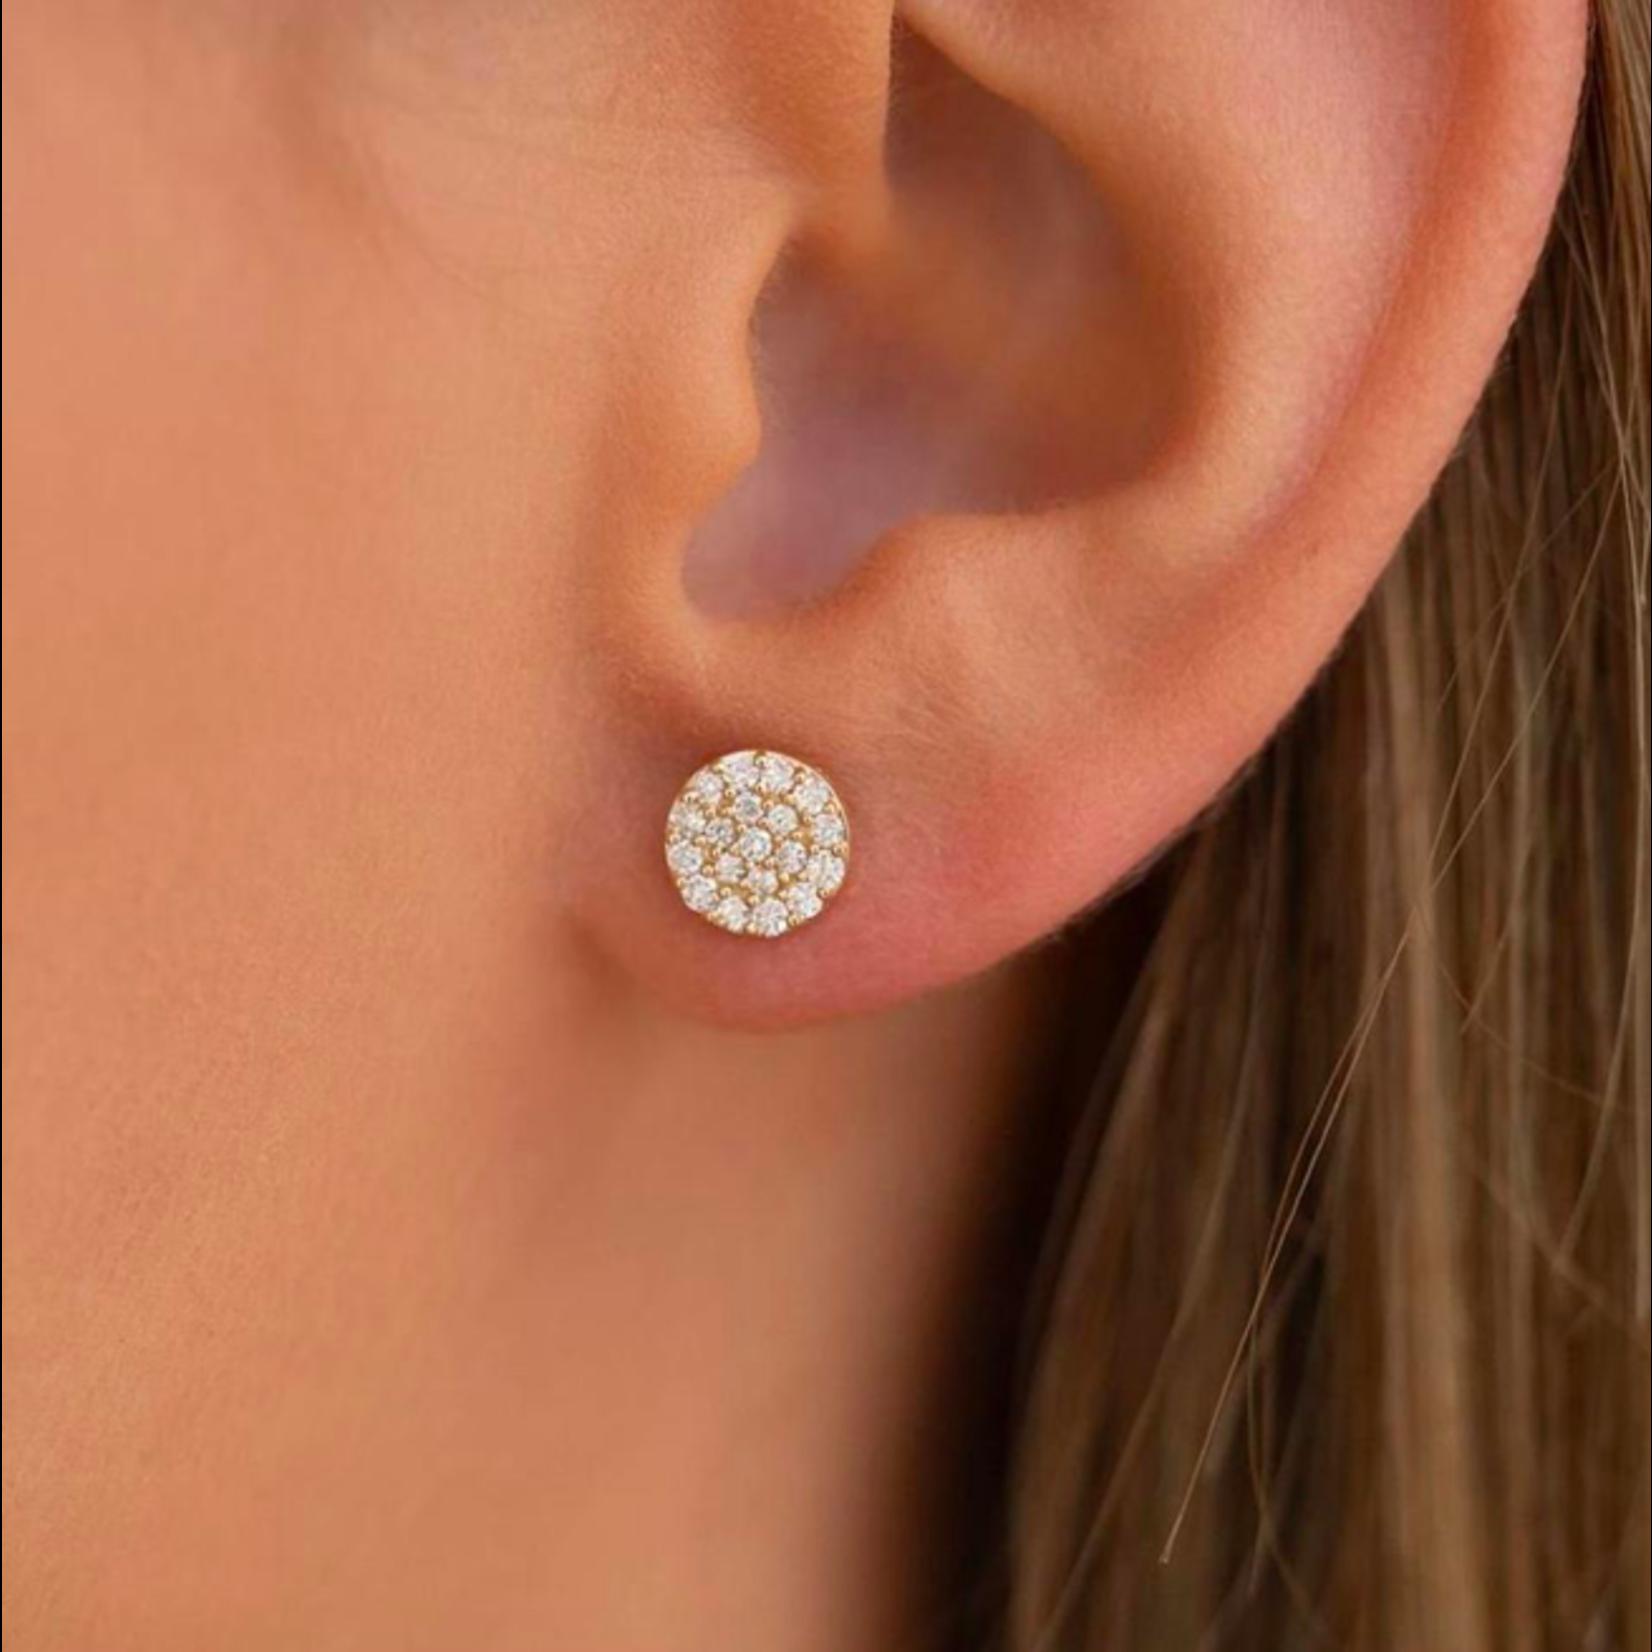 14KW Gold Round Pave Diamond 0.33ctw Stud Earrings